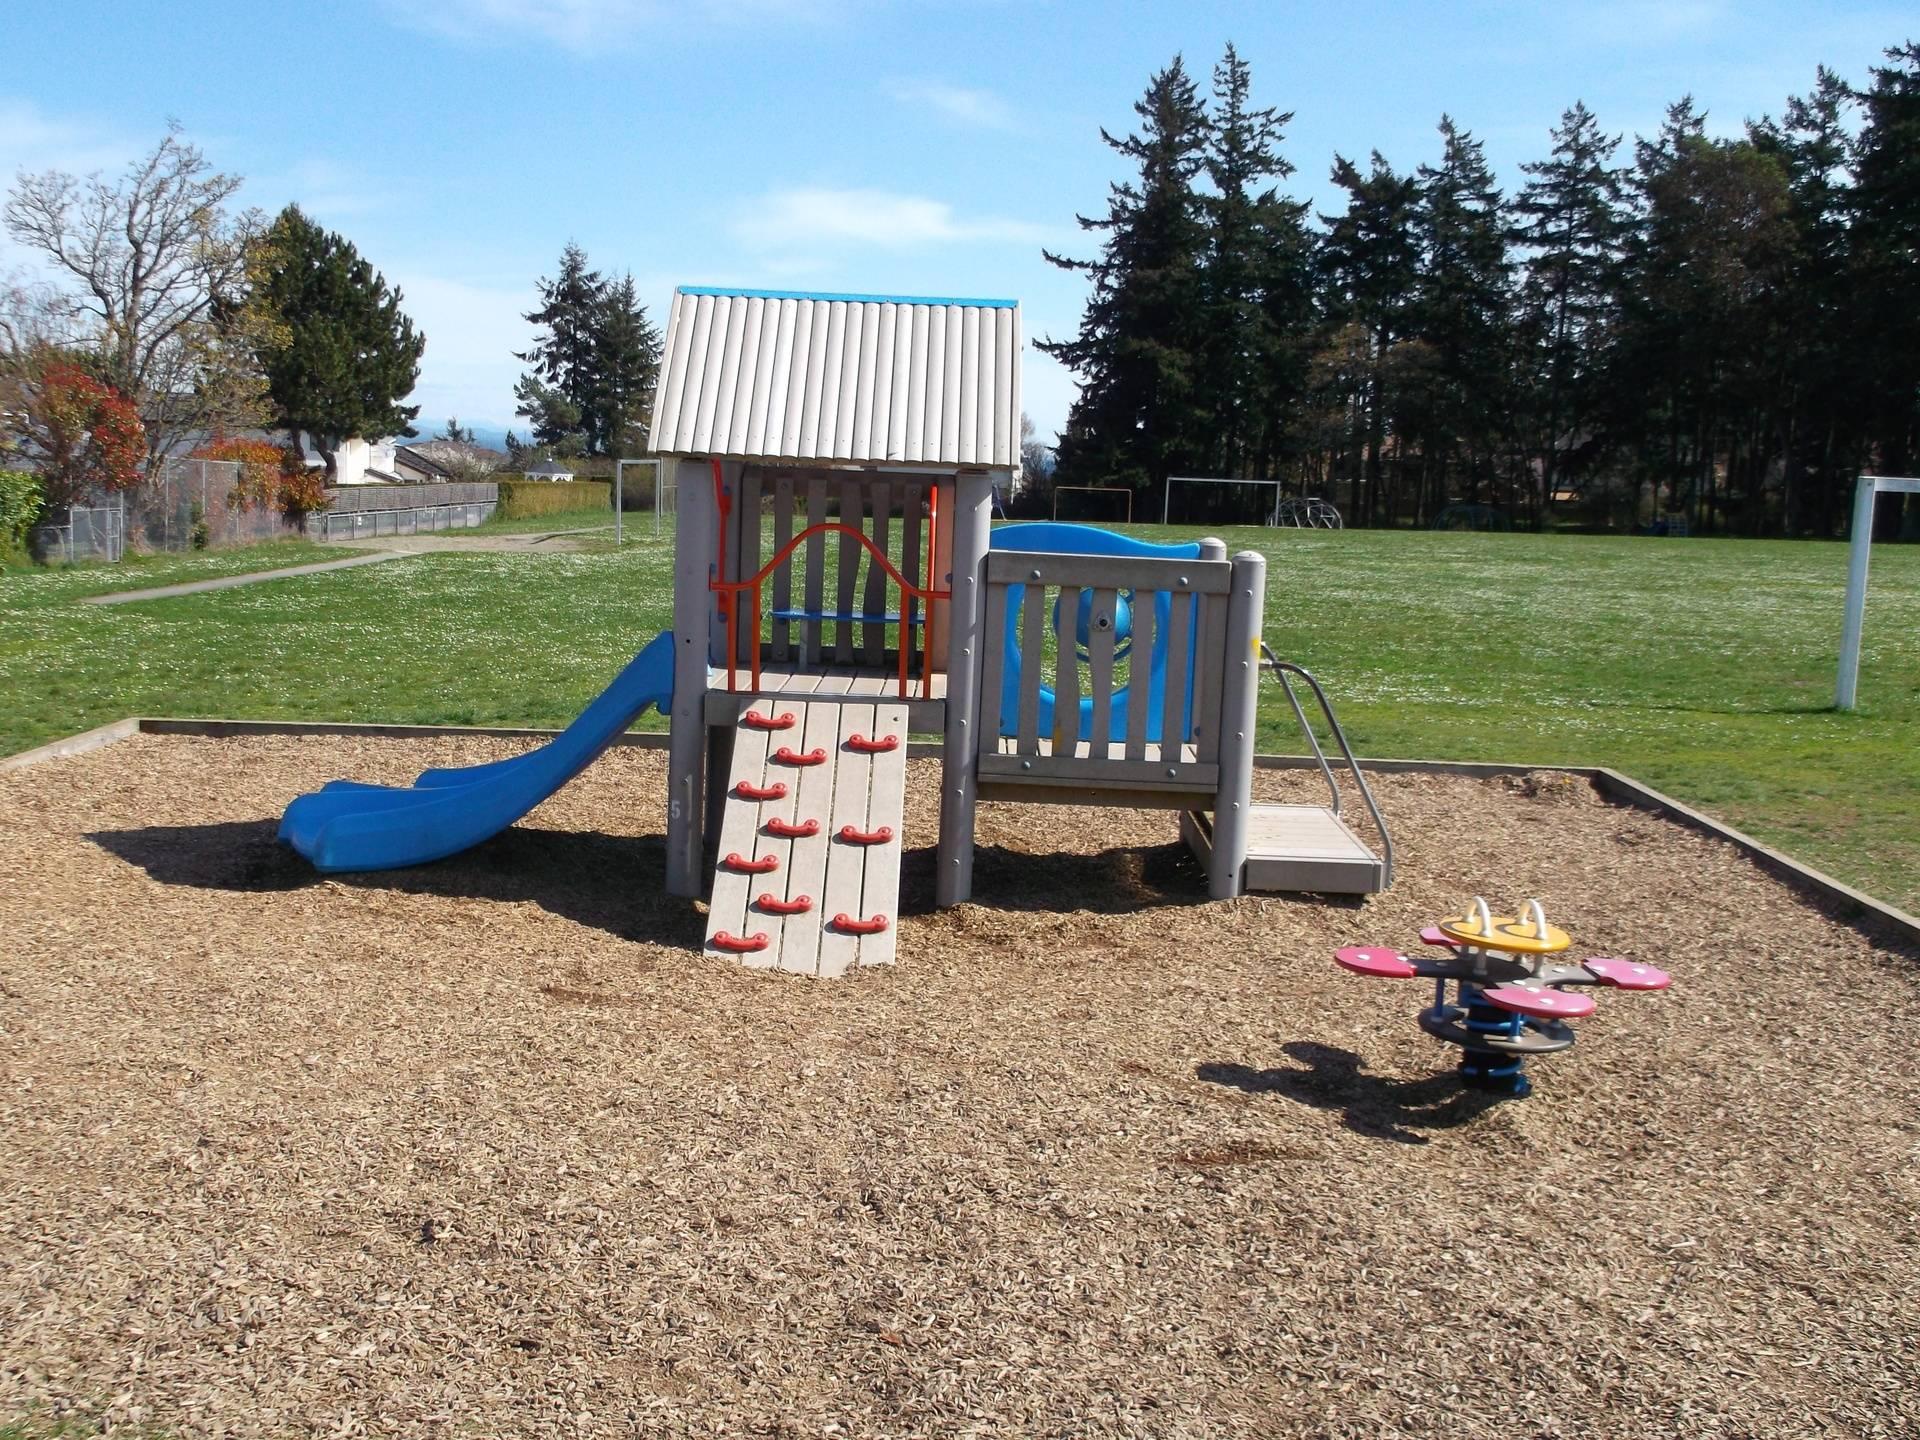 The Preschool Playground